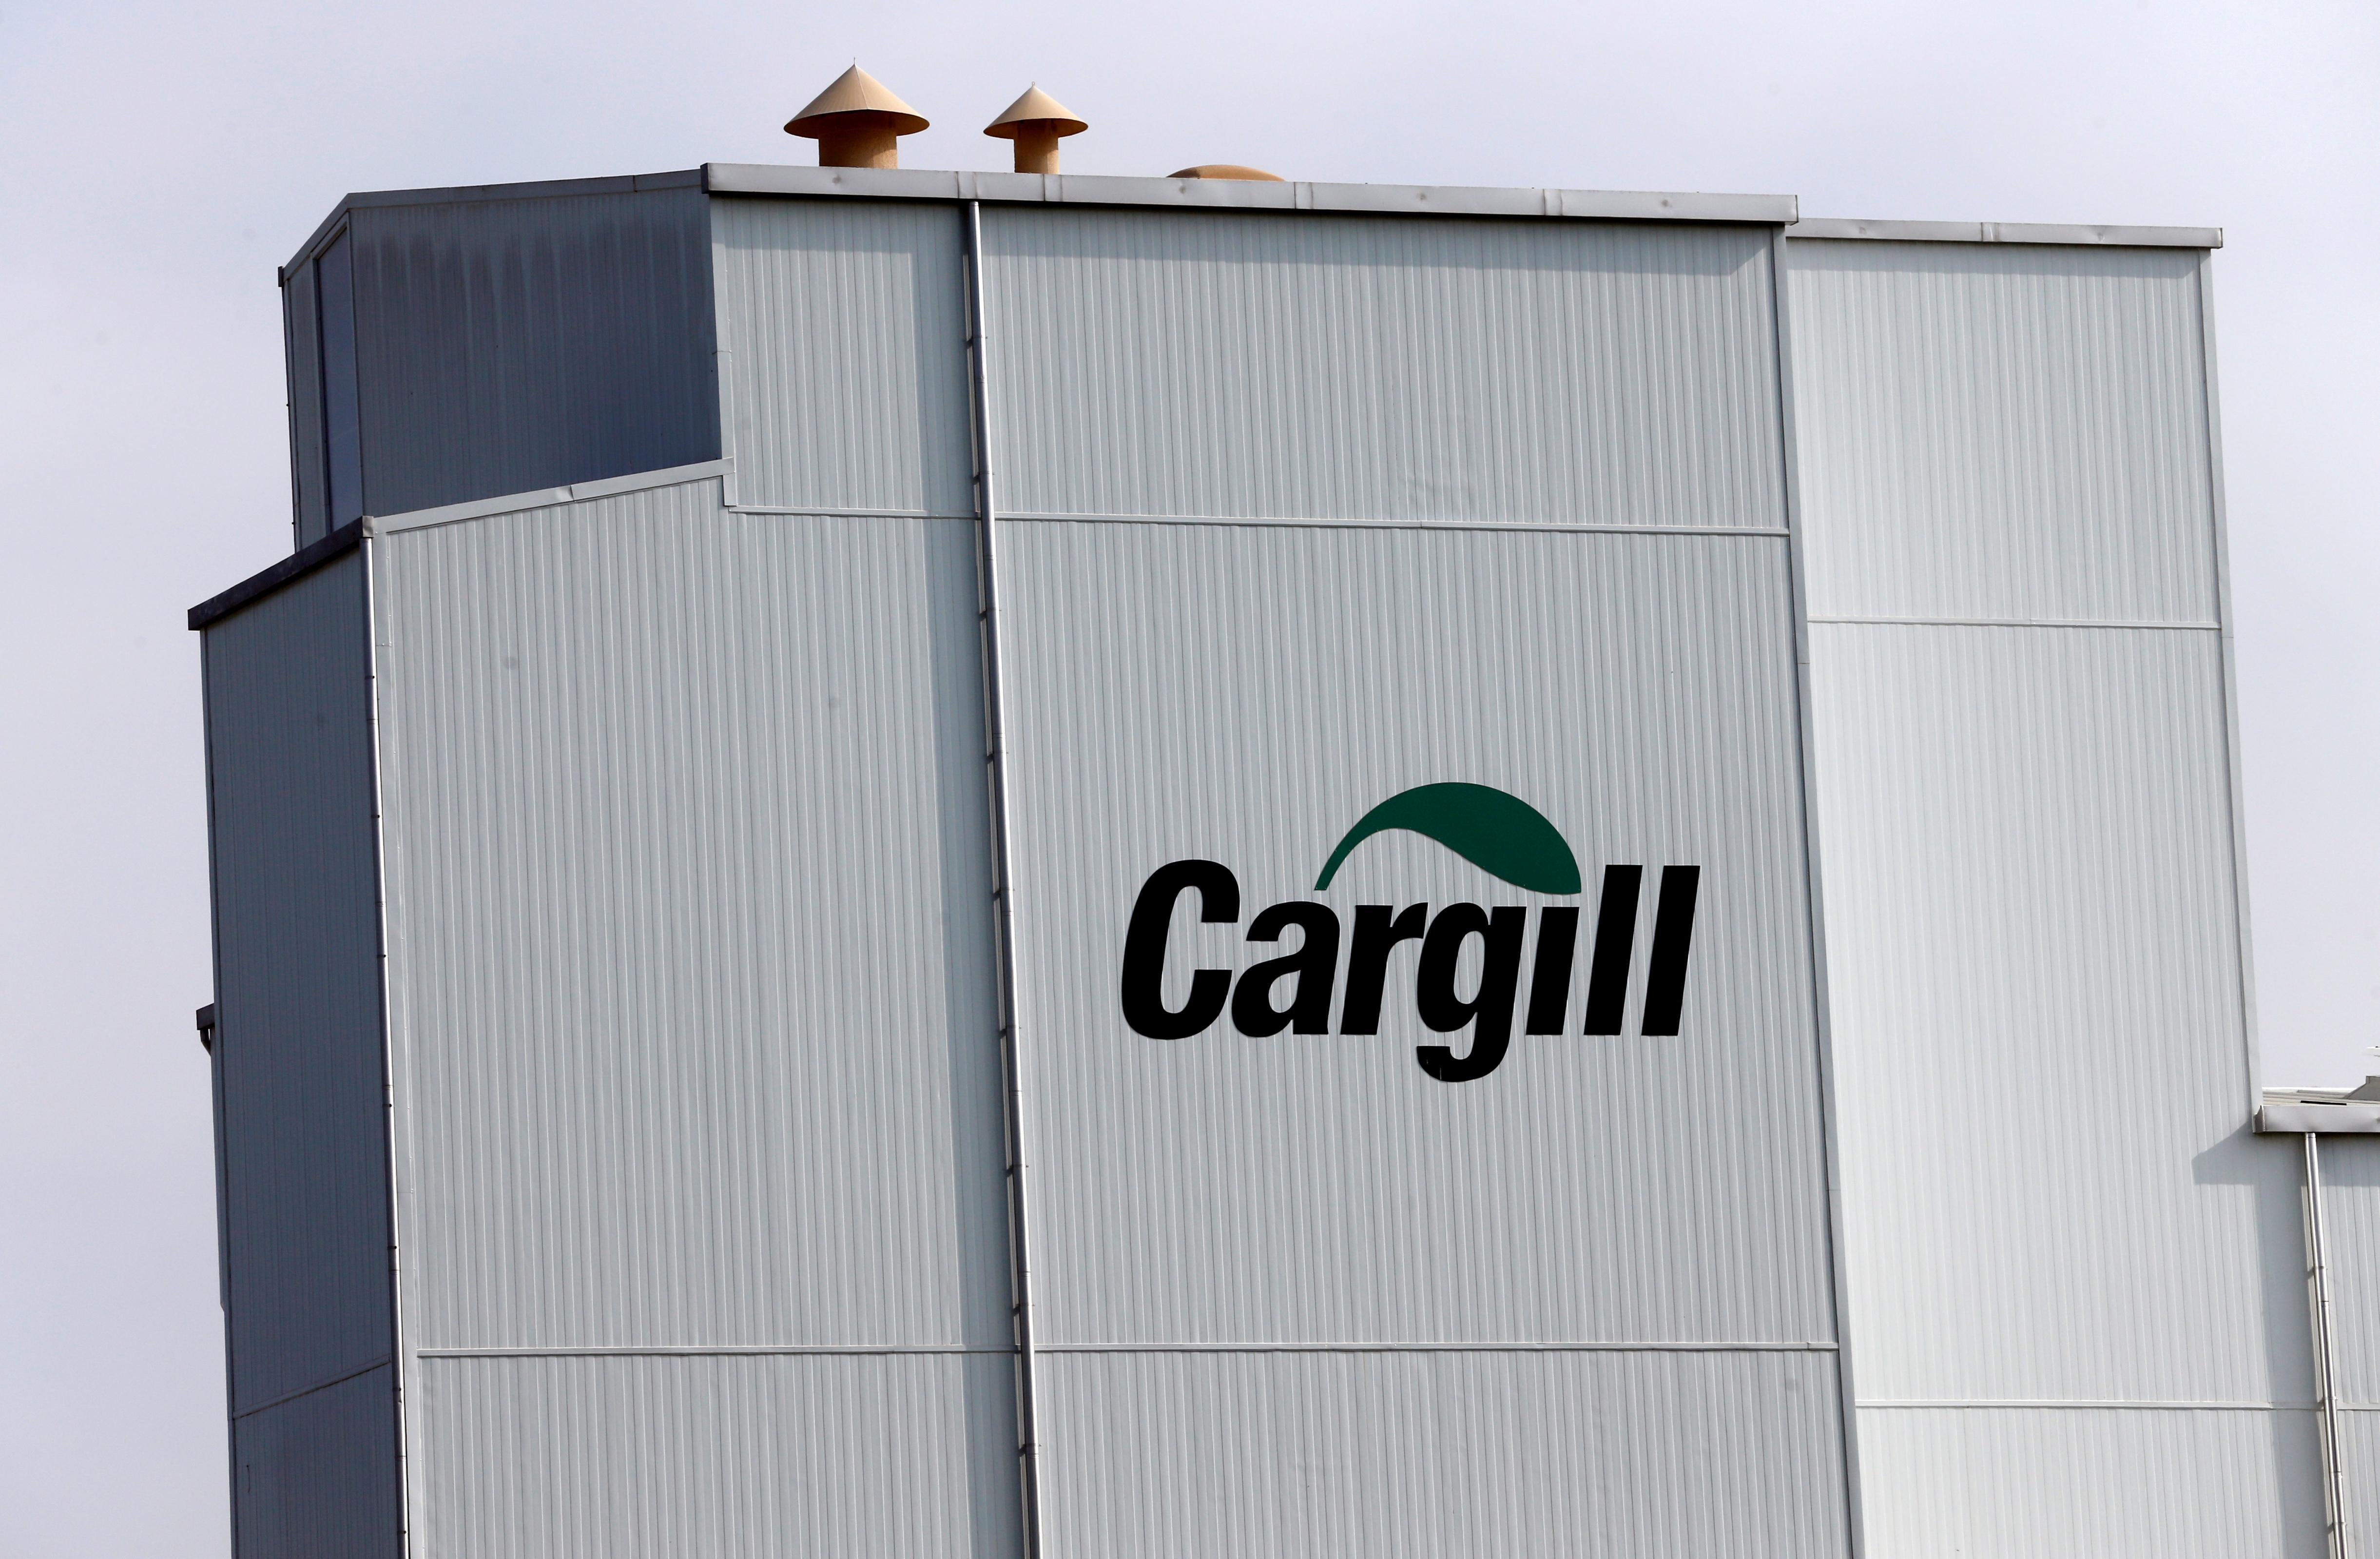 CFTC awards nearly $2.5 million to Cargill whistleblower